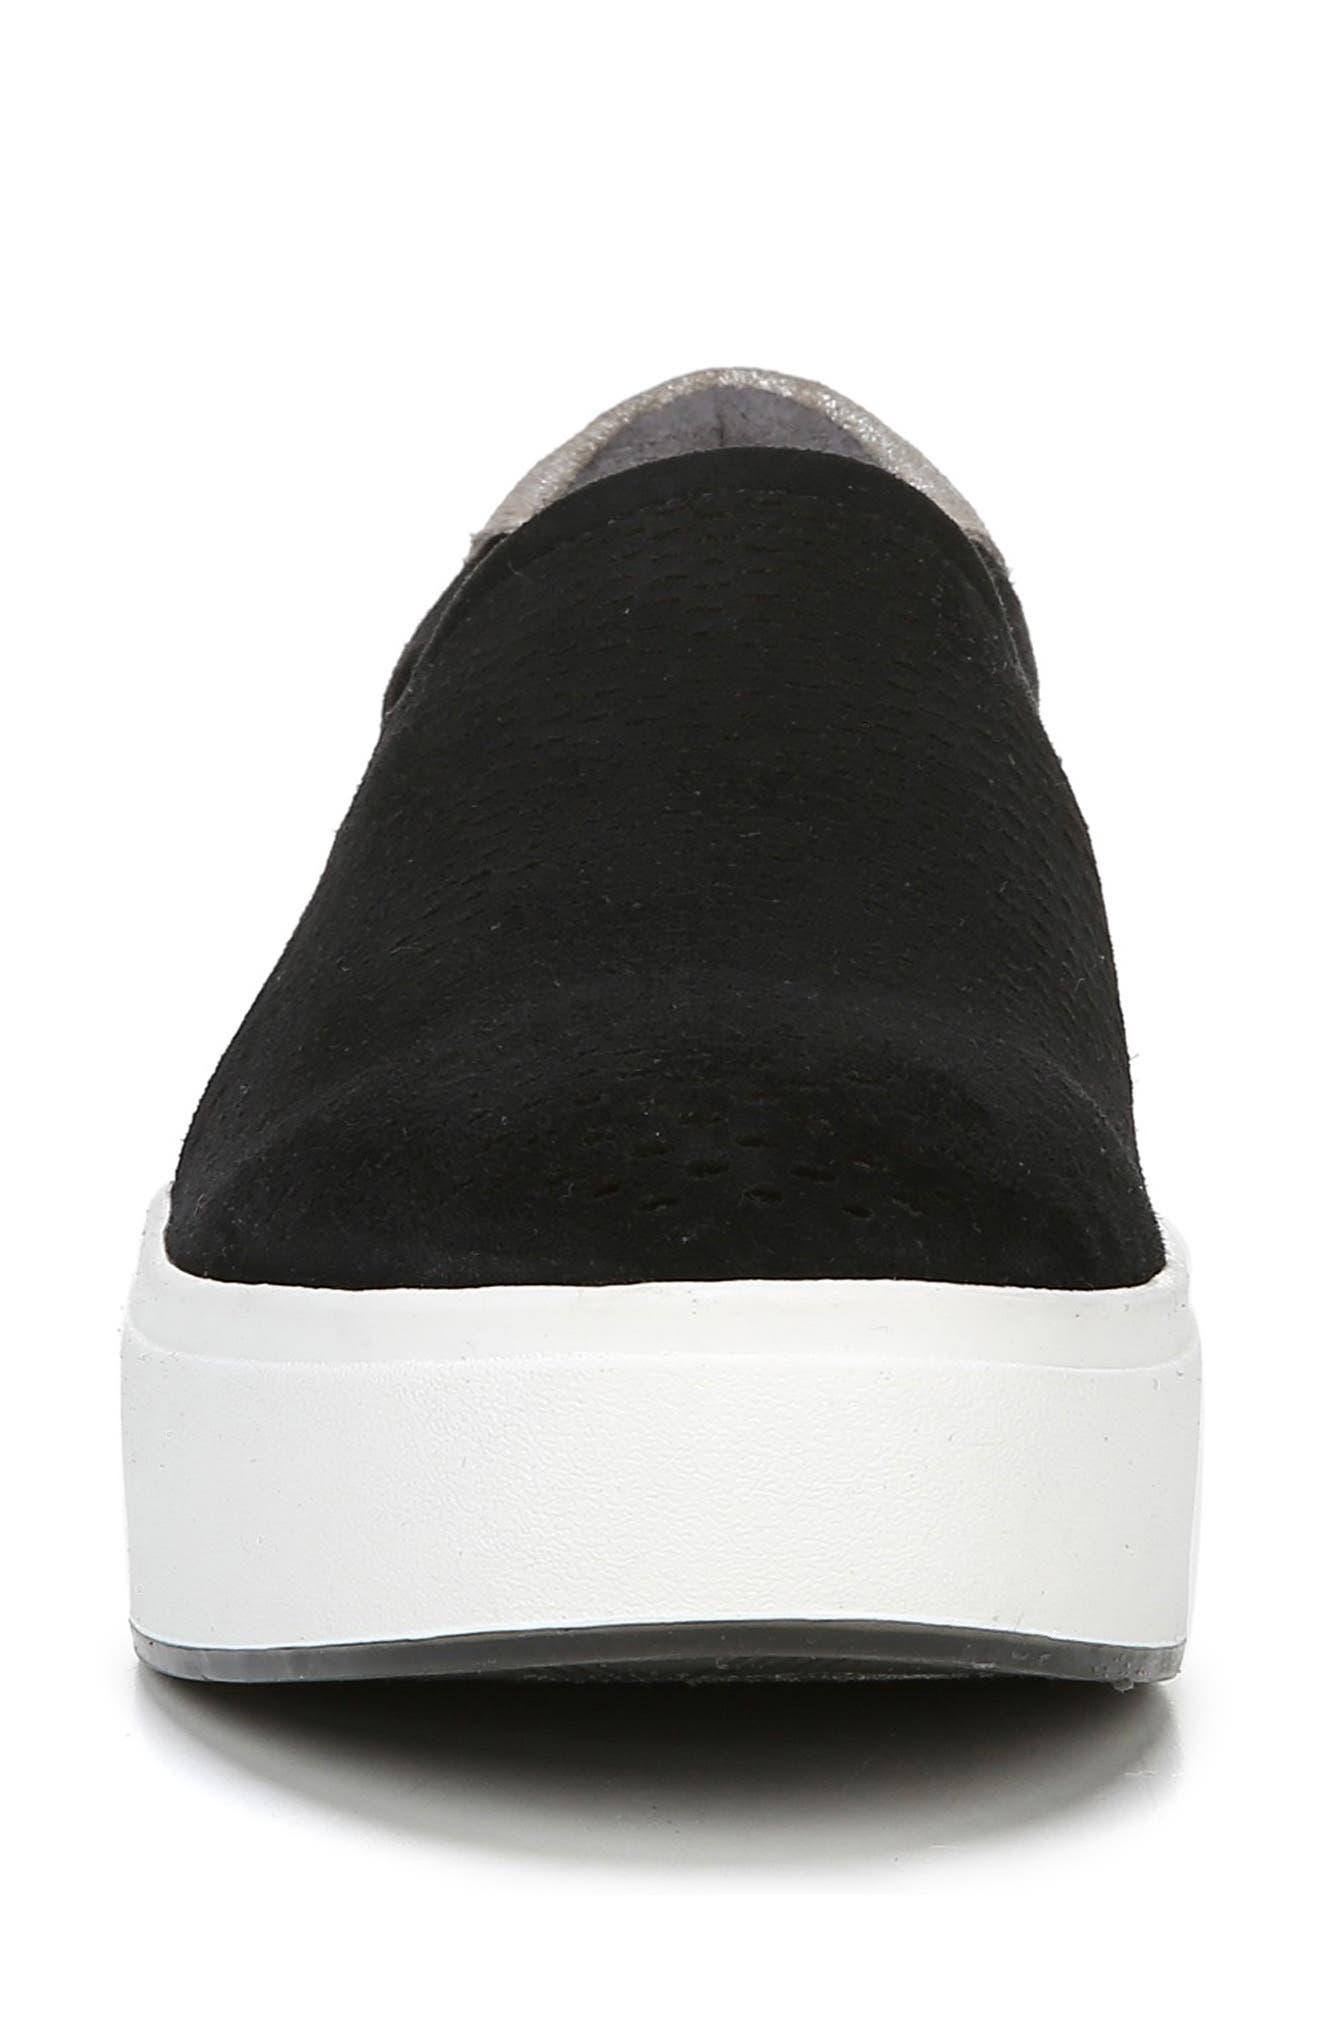 DR. SCHOLL'S, Abbot Lux Sneaker, Alternate thumbnail 4, color, BLACK SUEDE